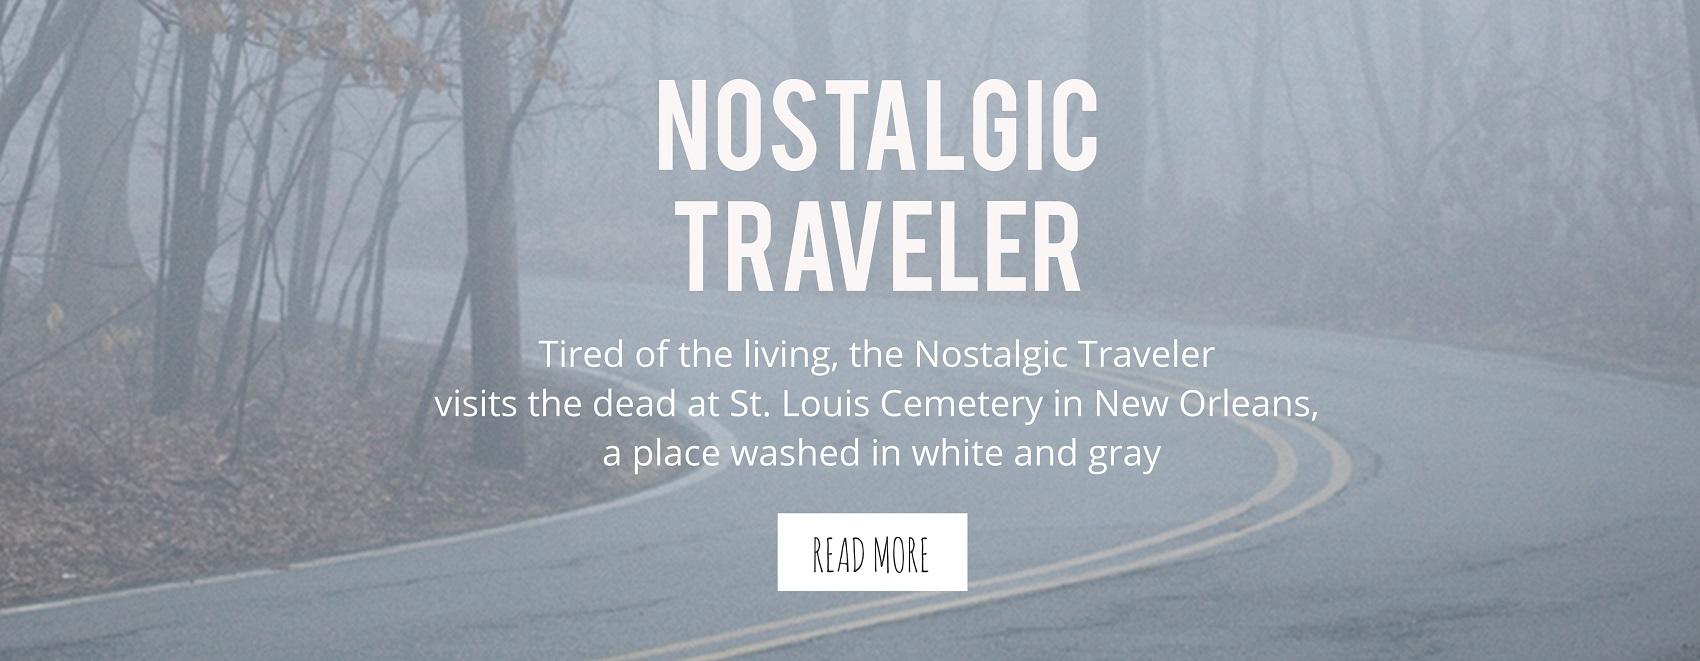 nostalgic-traveler-readmore-21